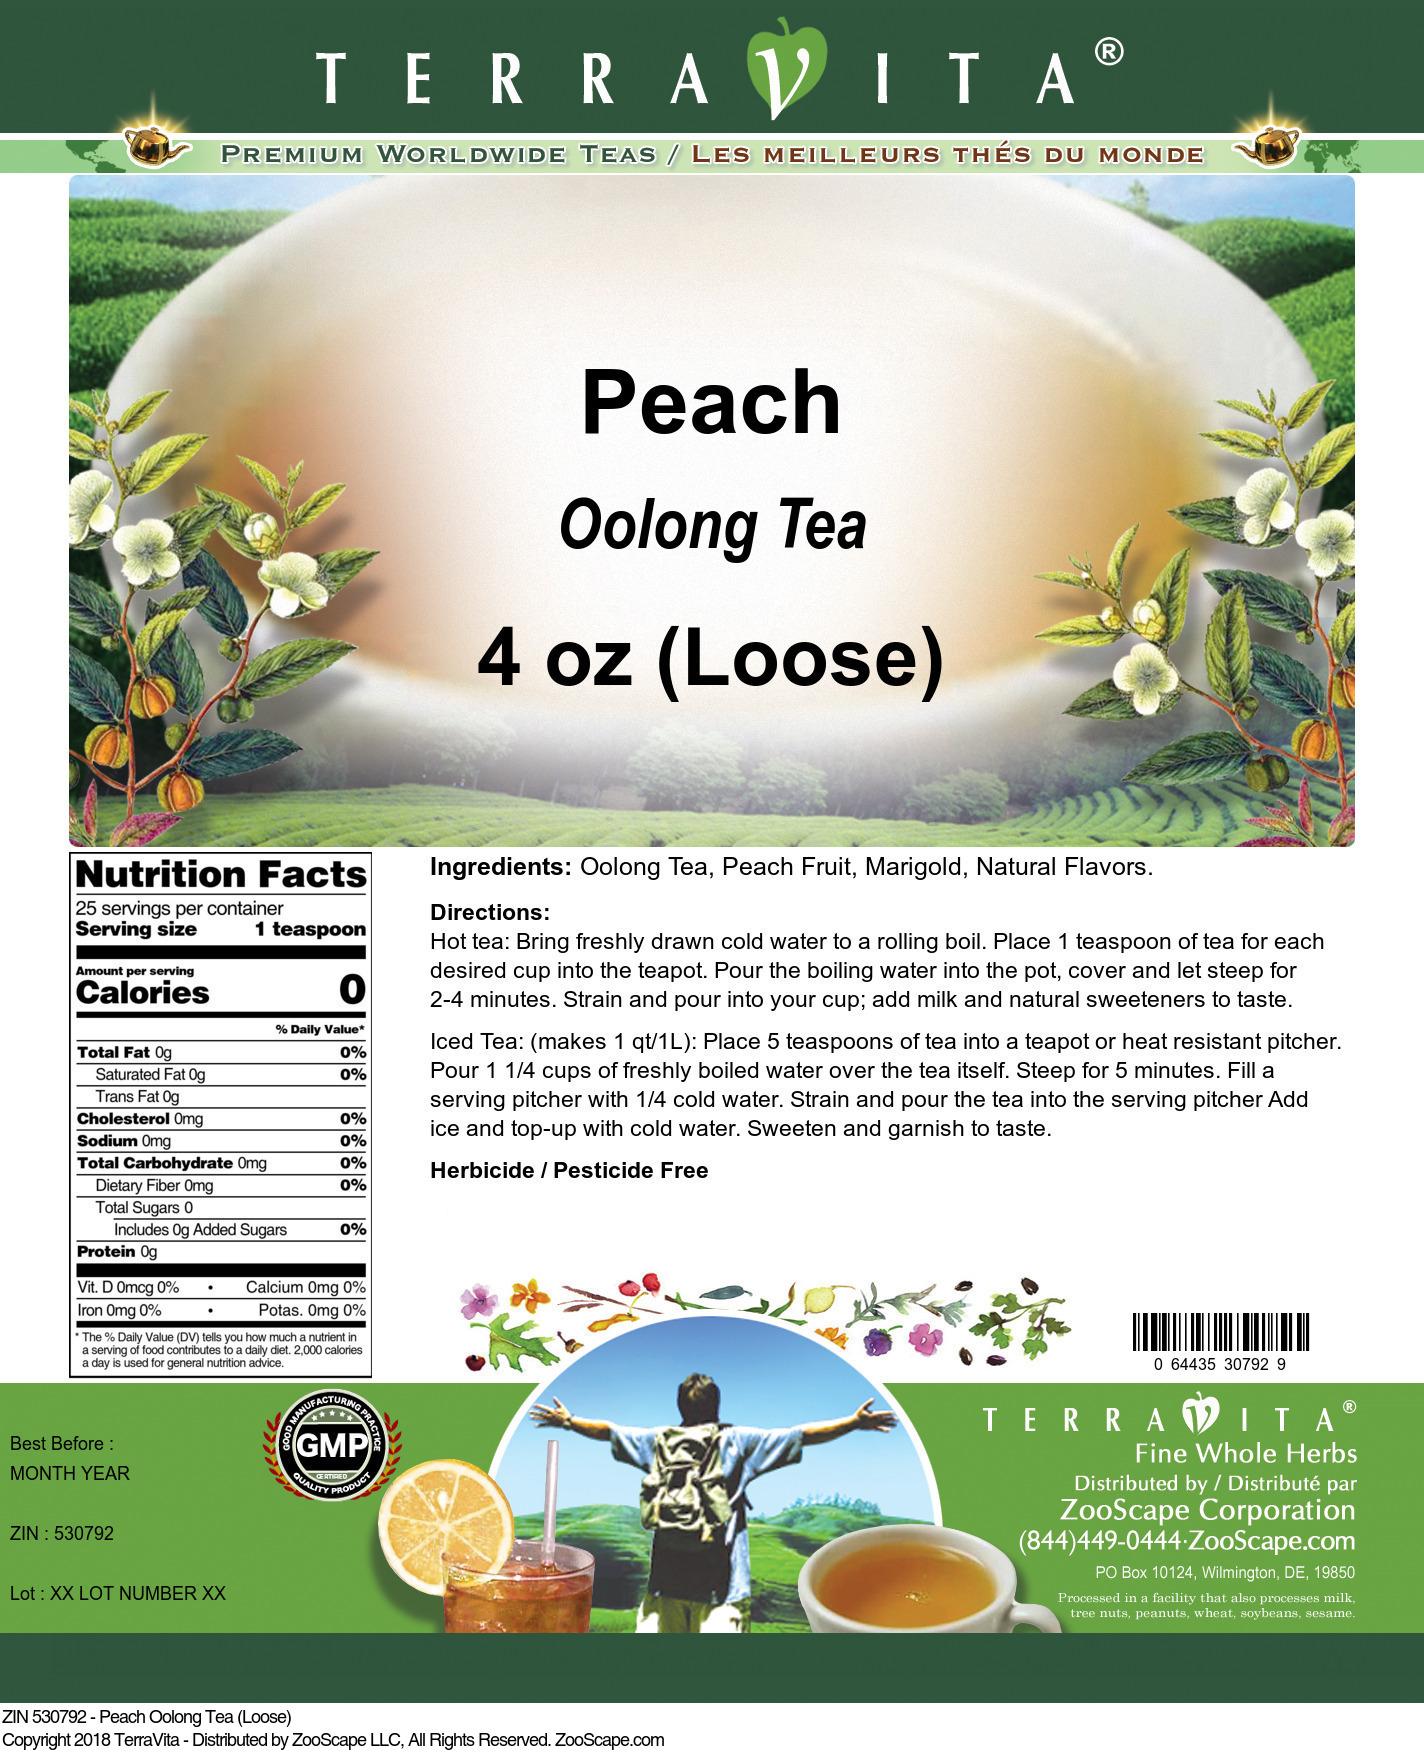 Peach Oolong Tea